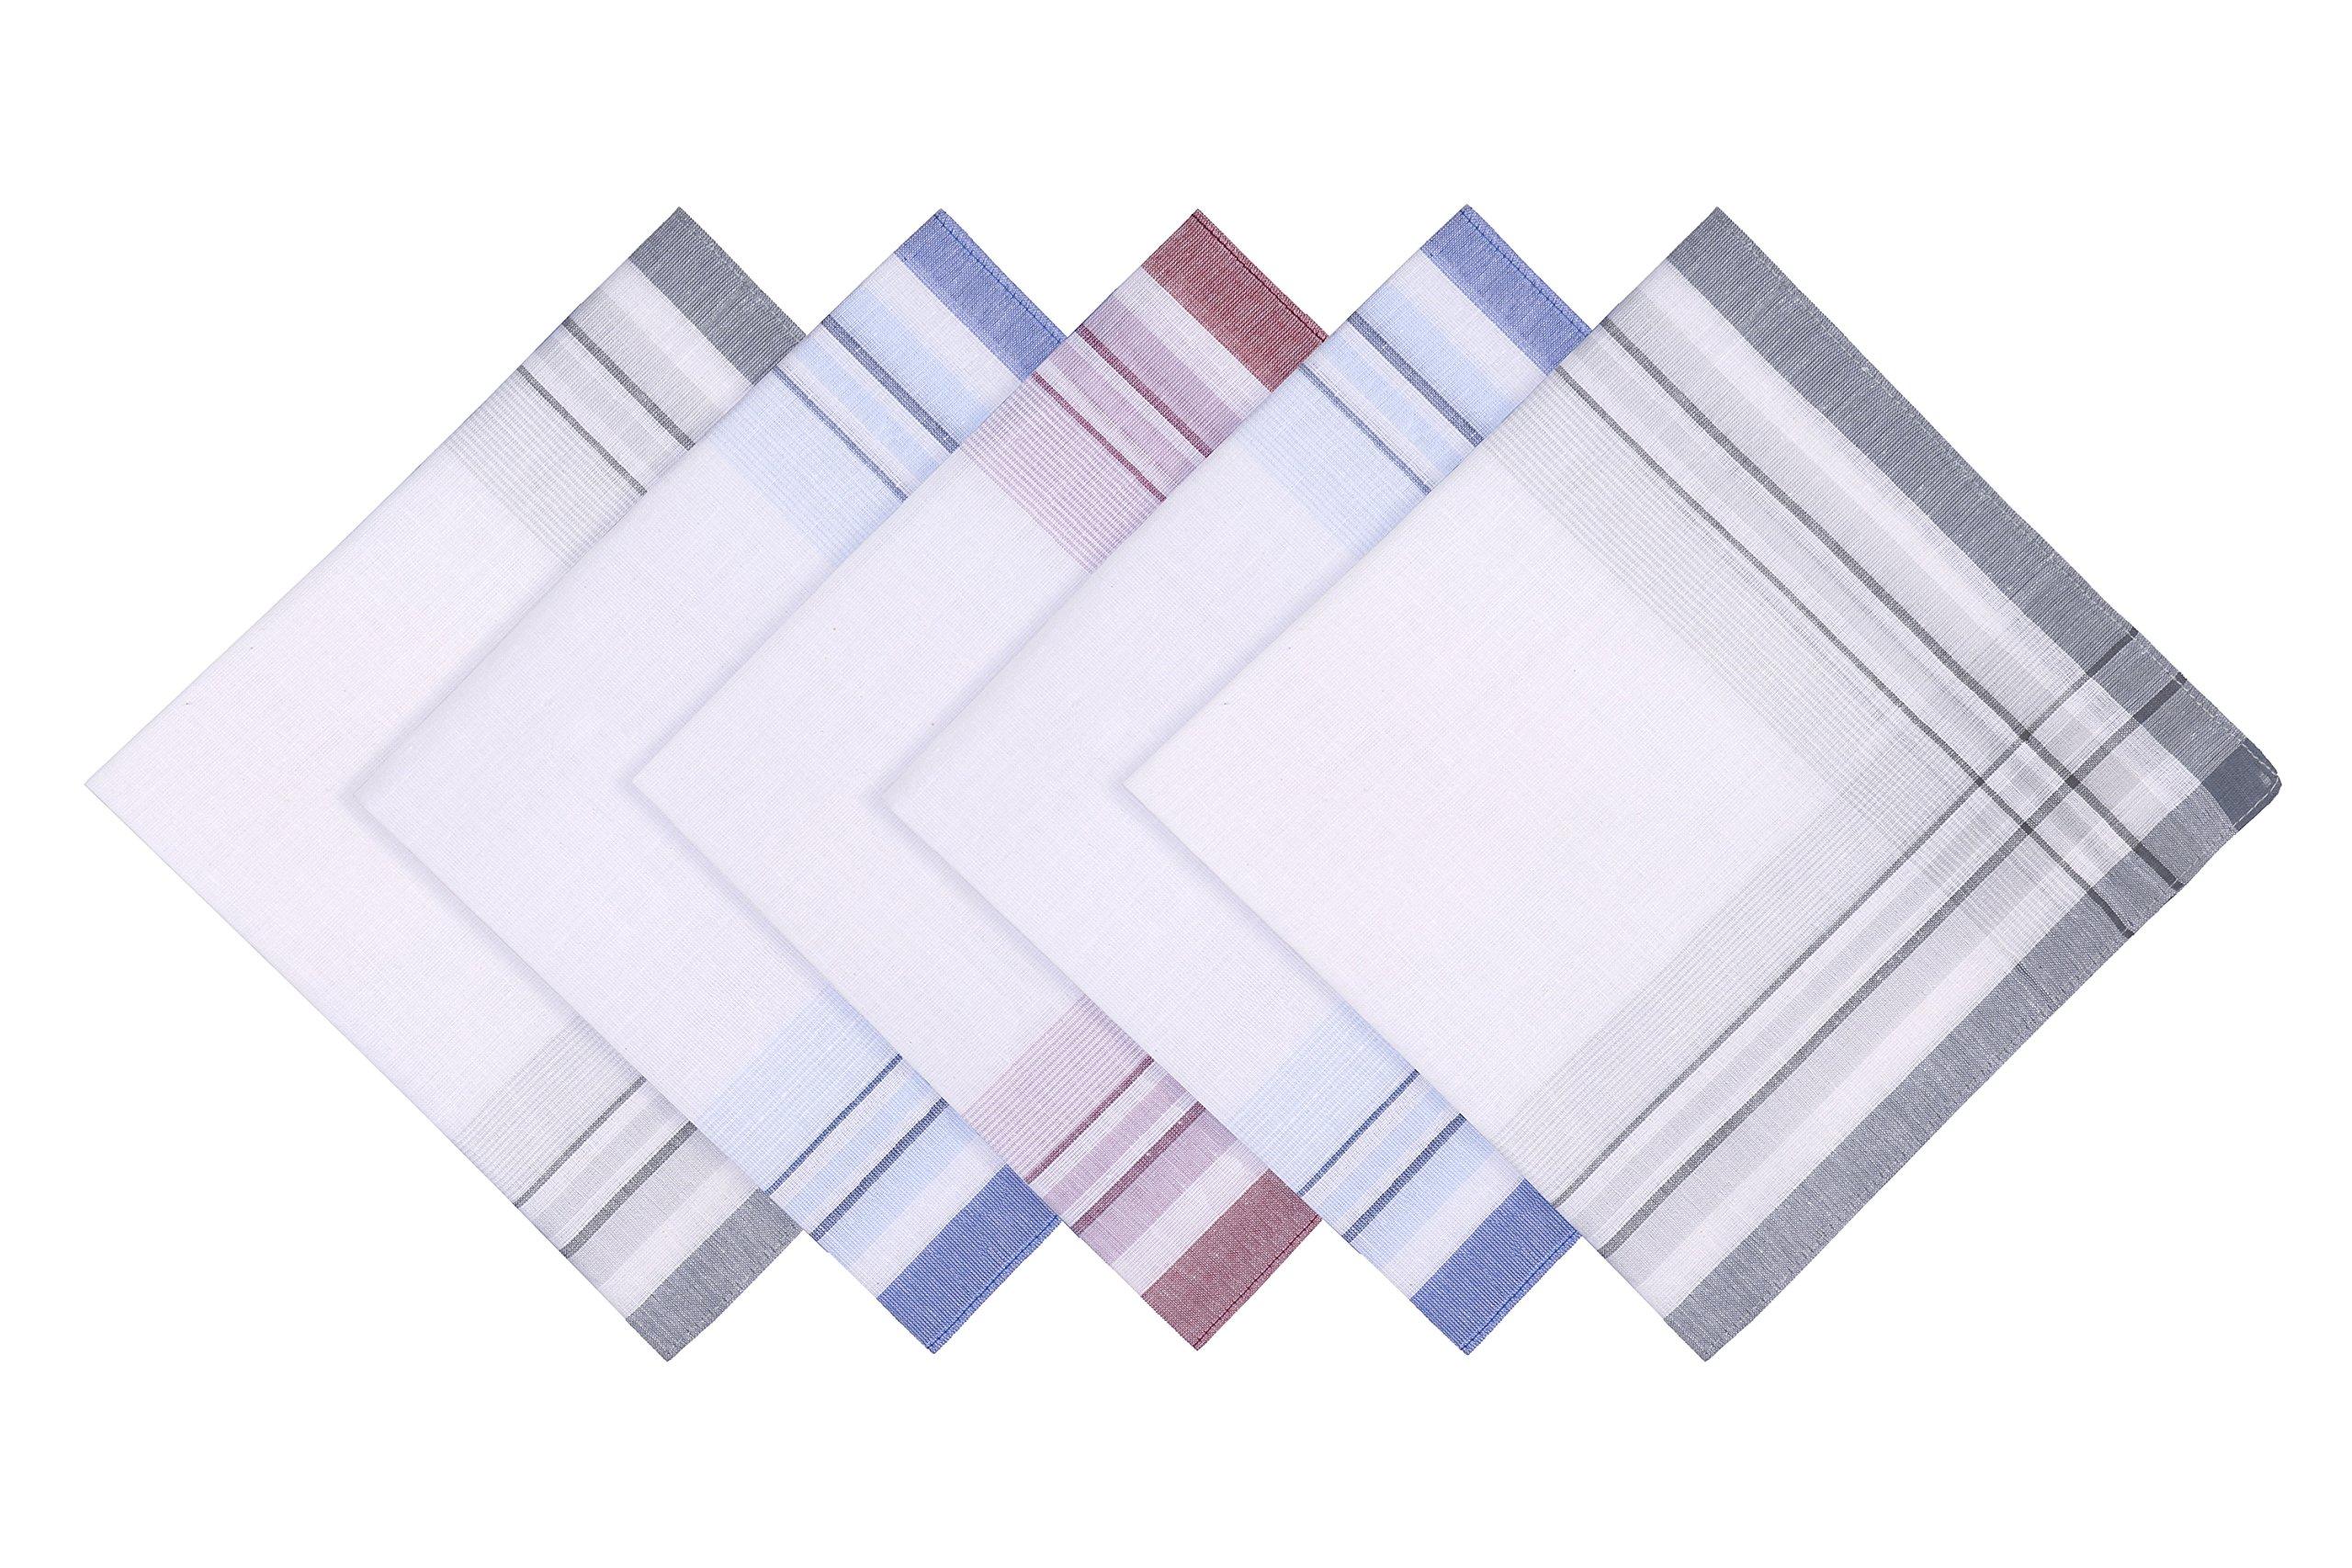 Blank&Black 100% Cotton Men's Handkerchief 5 Piece Gift Set Assorted Pack, 3, 40S